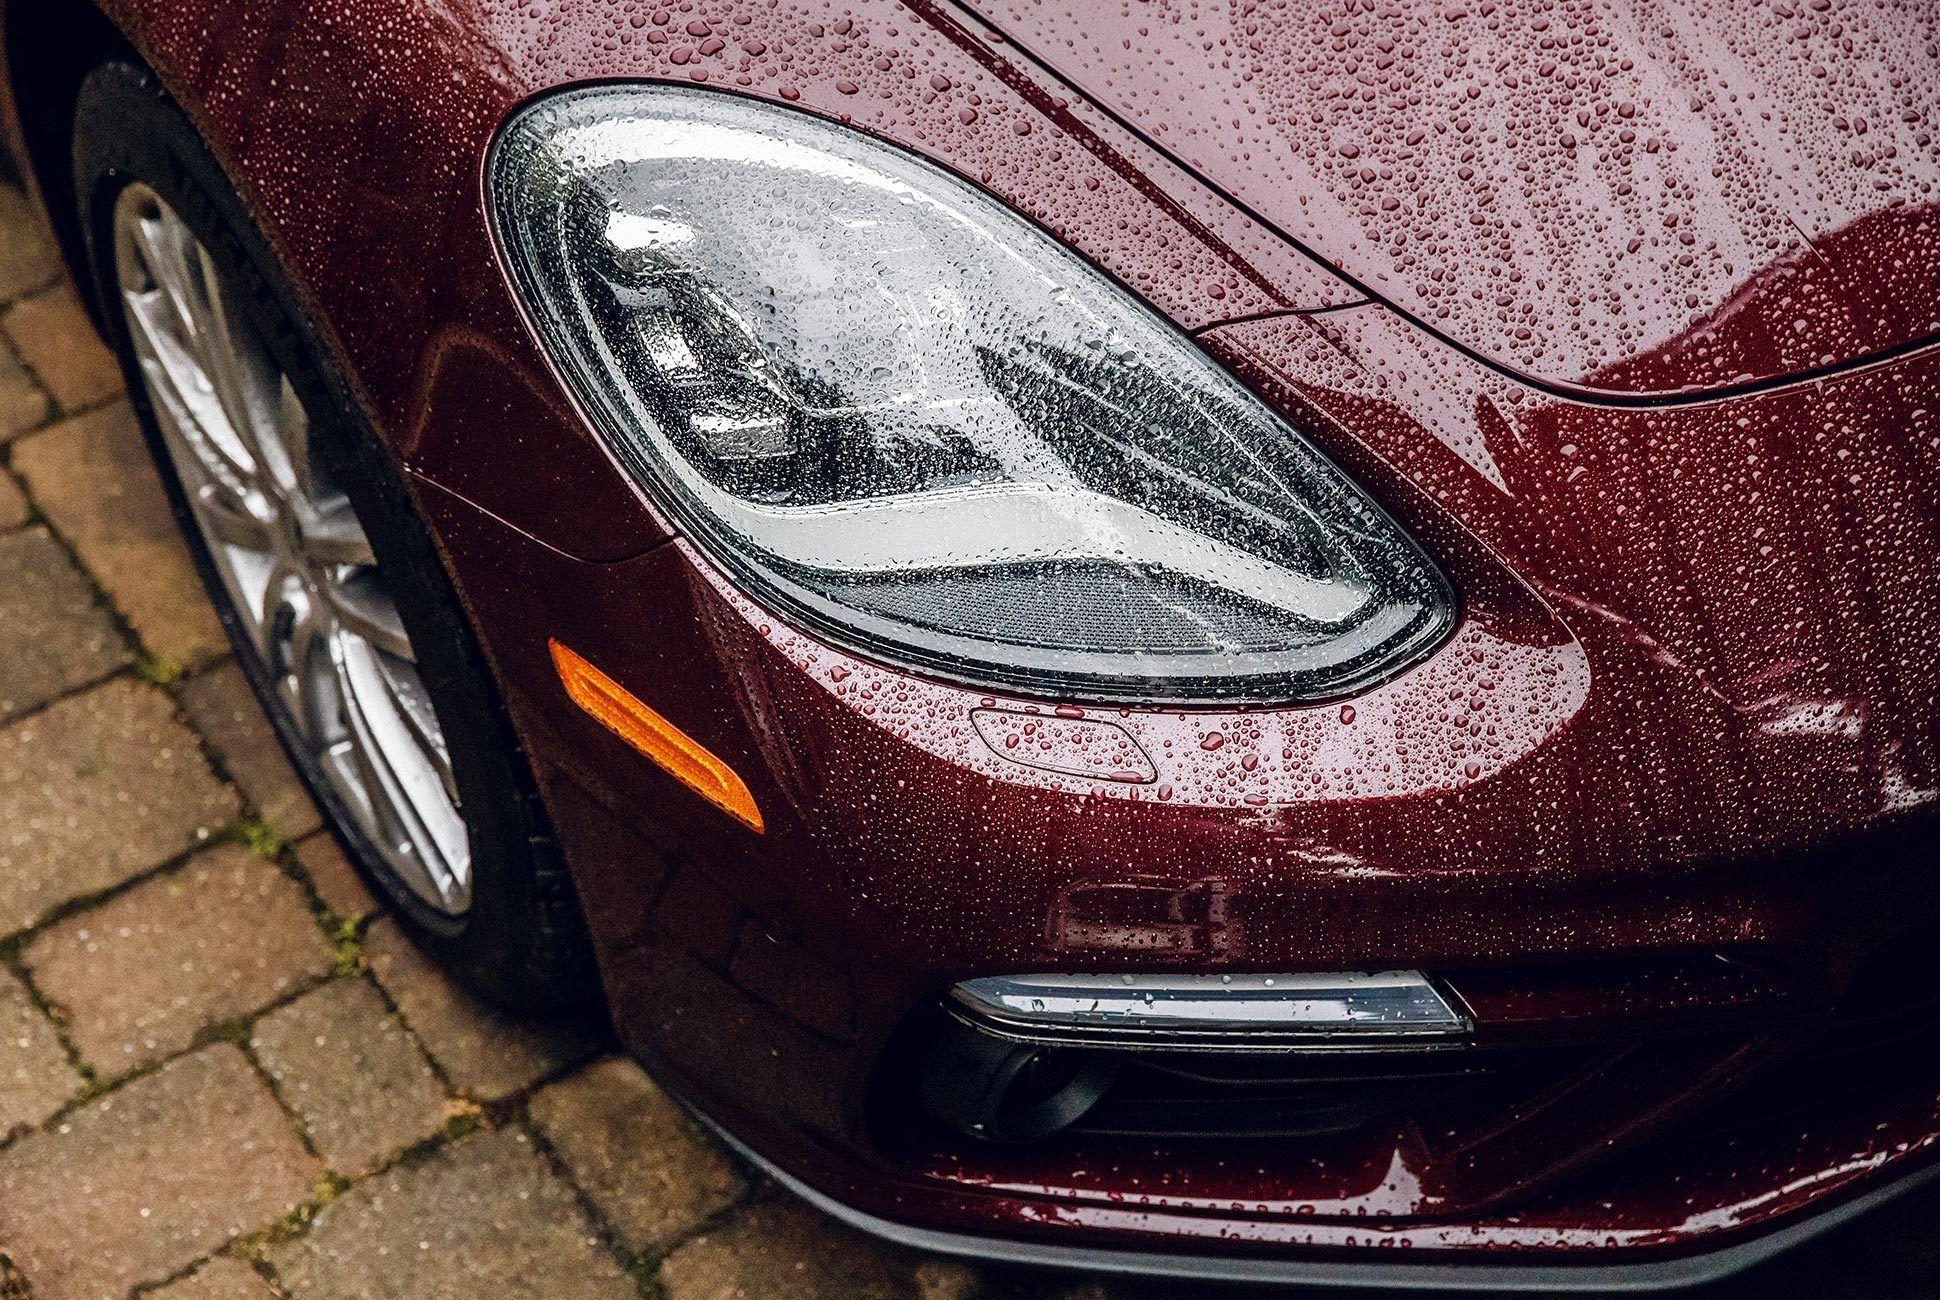 Porsche-Panamera-Turbo-Sport-Turismo-Review-gear-patrol-slide-16